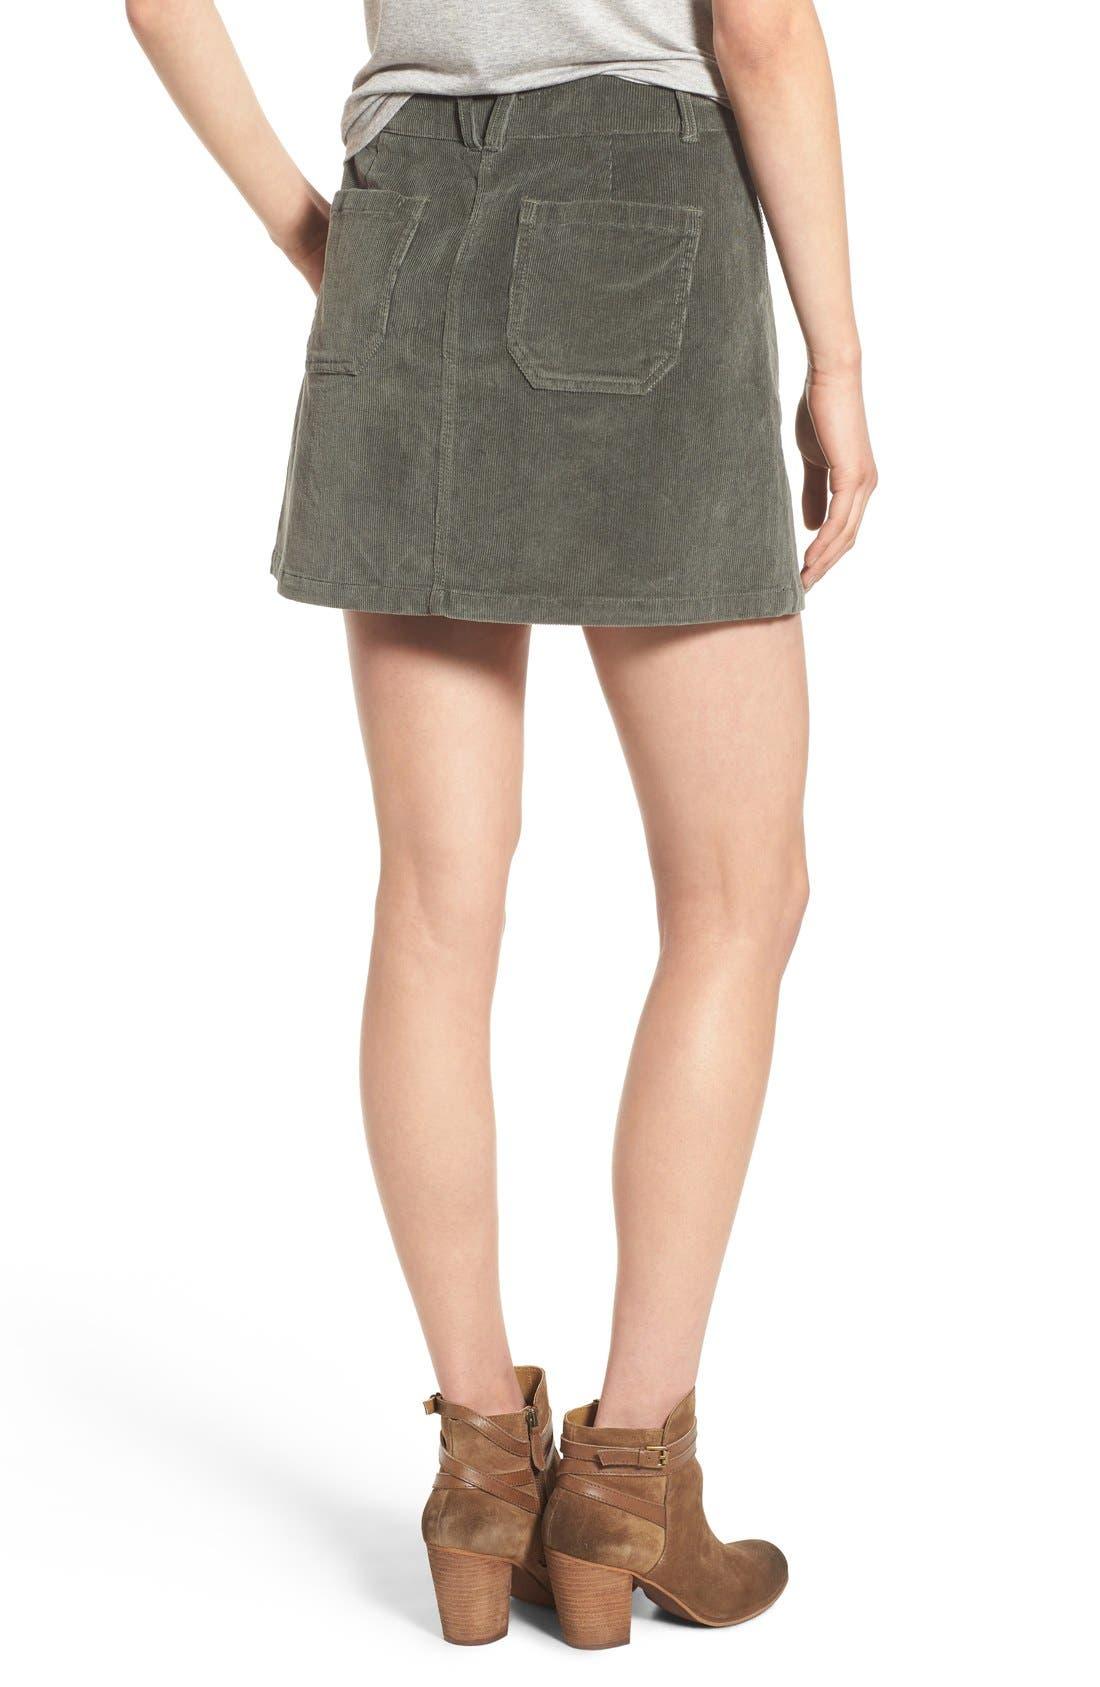 JOLT, Corduroy A-Line Skirt, Alternate thumbnail 4, color, 300